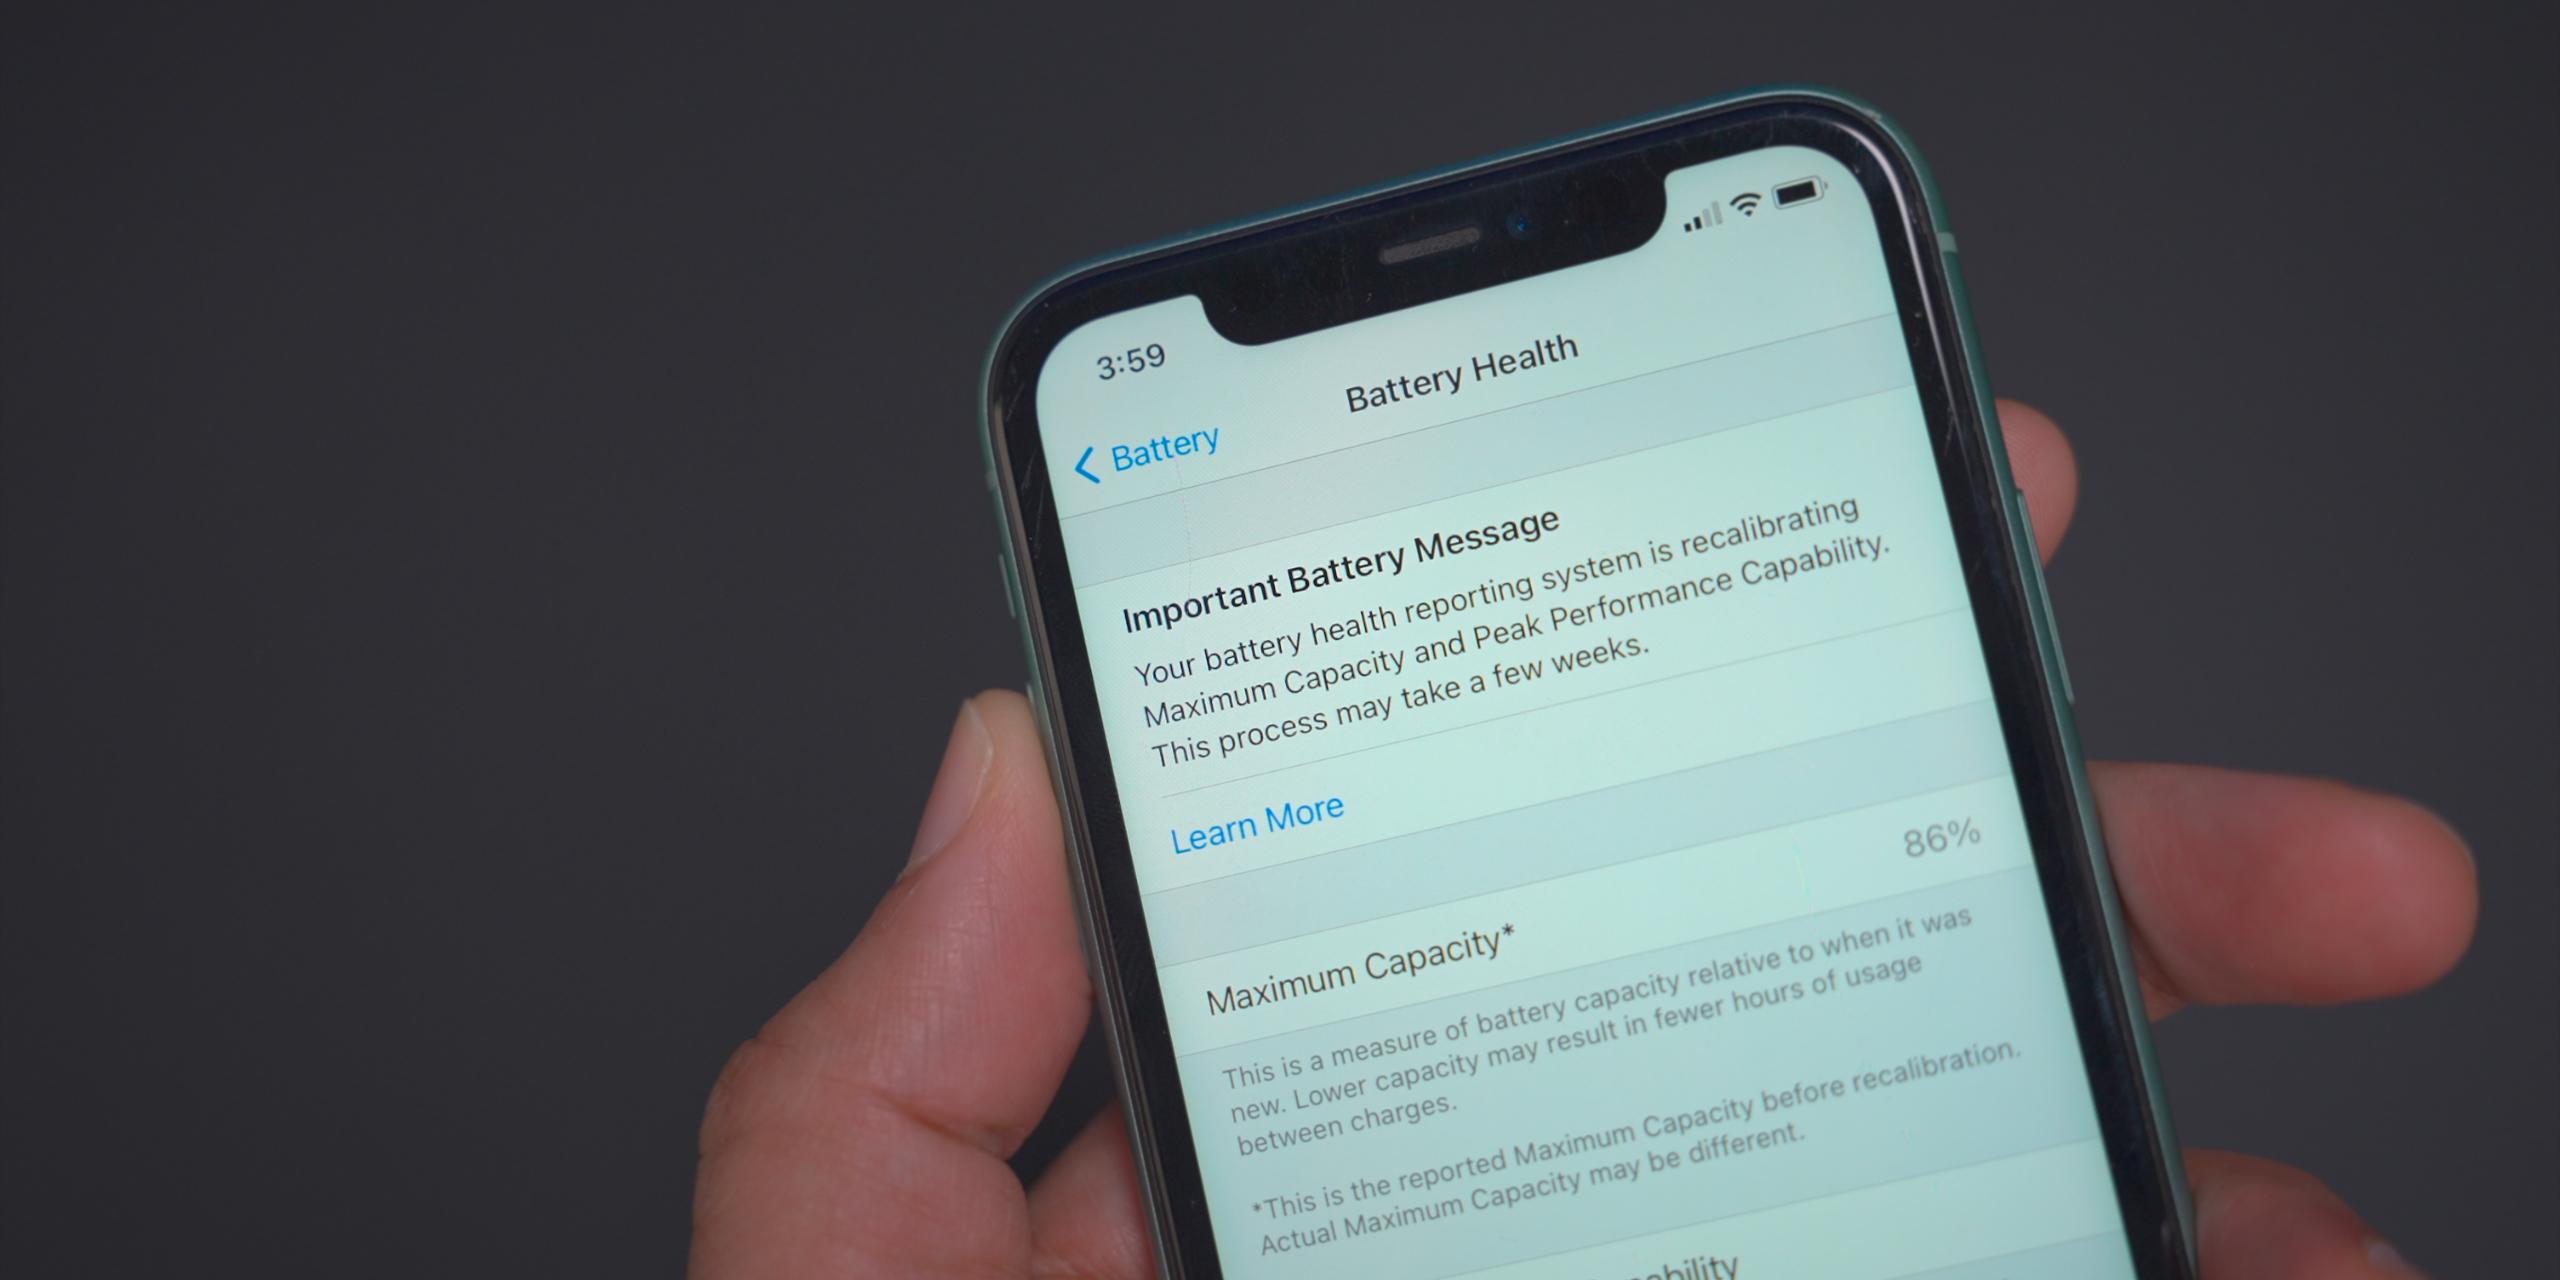 iphone 11 battery health settings ios 14 5 beta 6